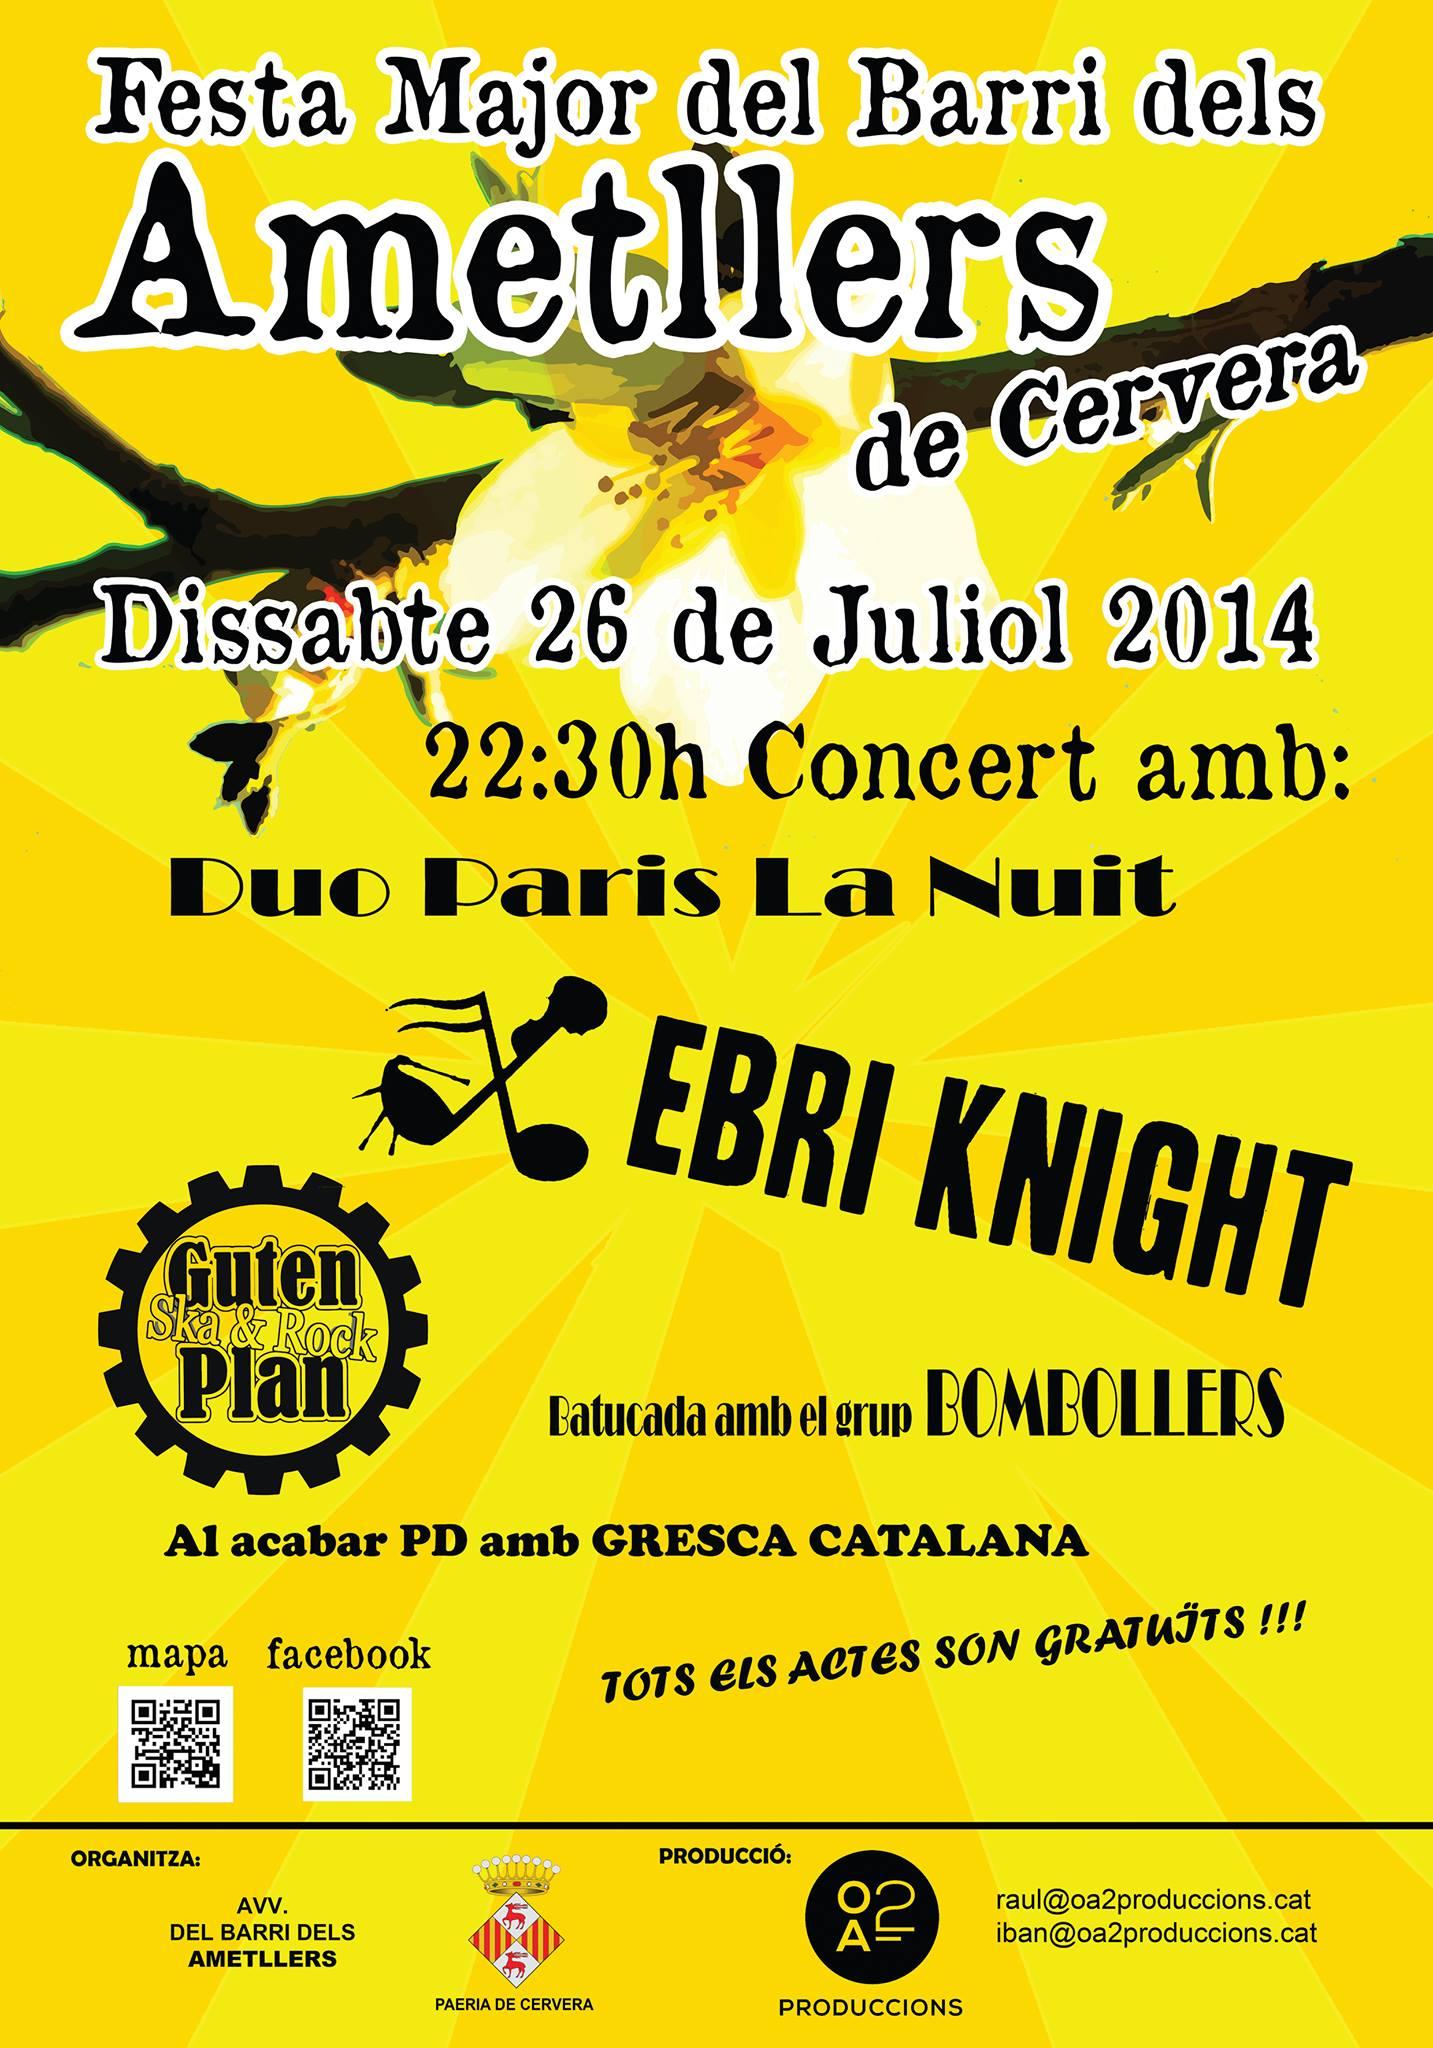 cartell Festa major Barri dels Ametllers 2014